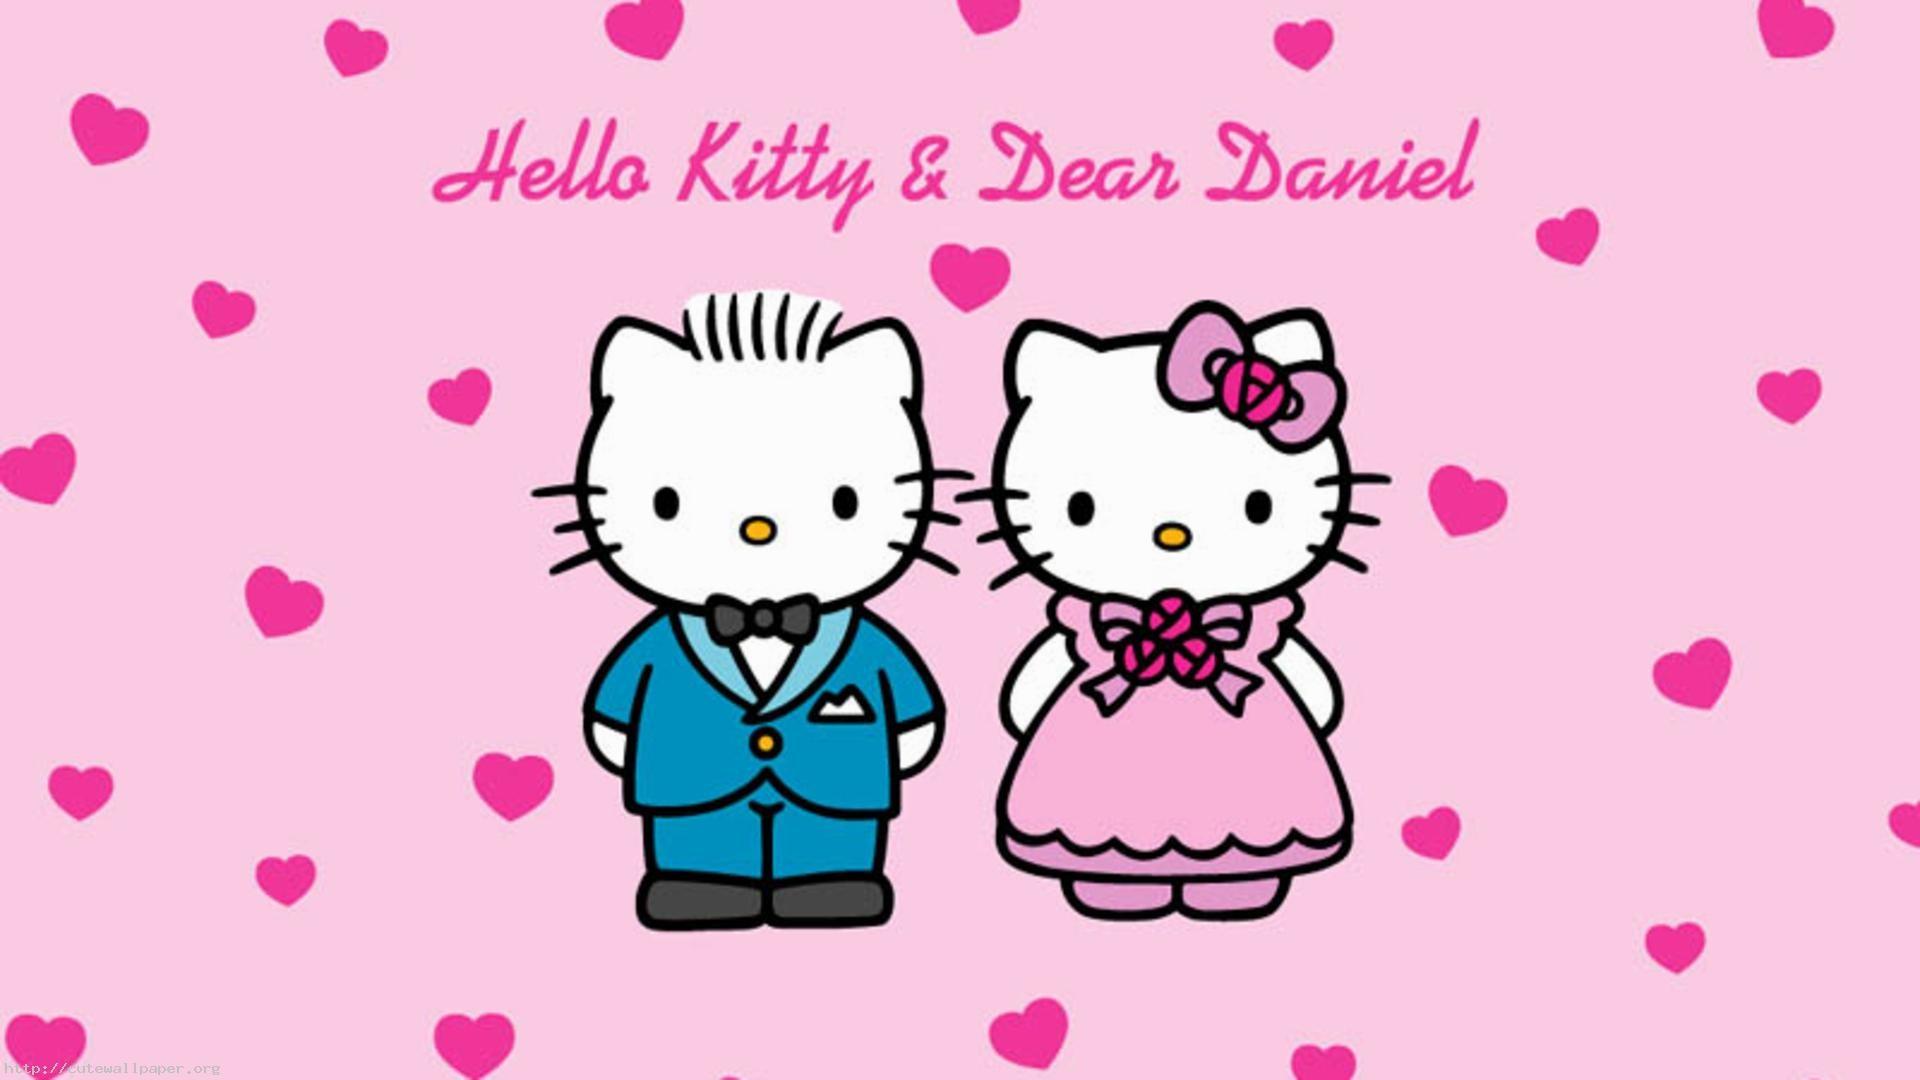 Hello kitty valentines wallpaper wallpapertag - Wallpaper hello kitty full hd ...